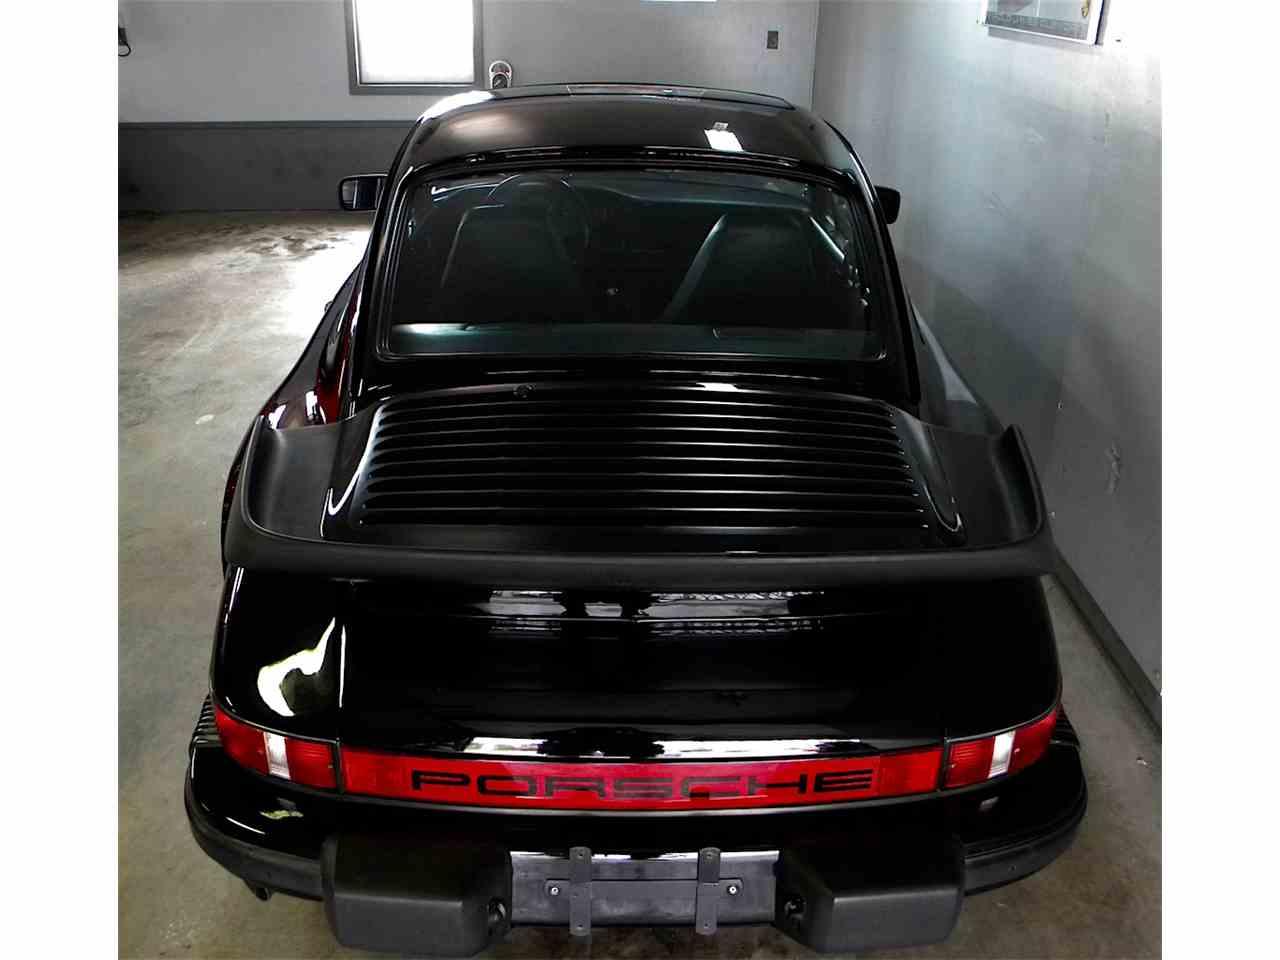 Large Picture of 1984 Porsche 911 Carrera 3.2 coupe - $69,500.00 - J4MC